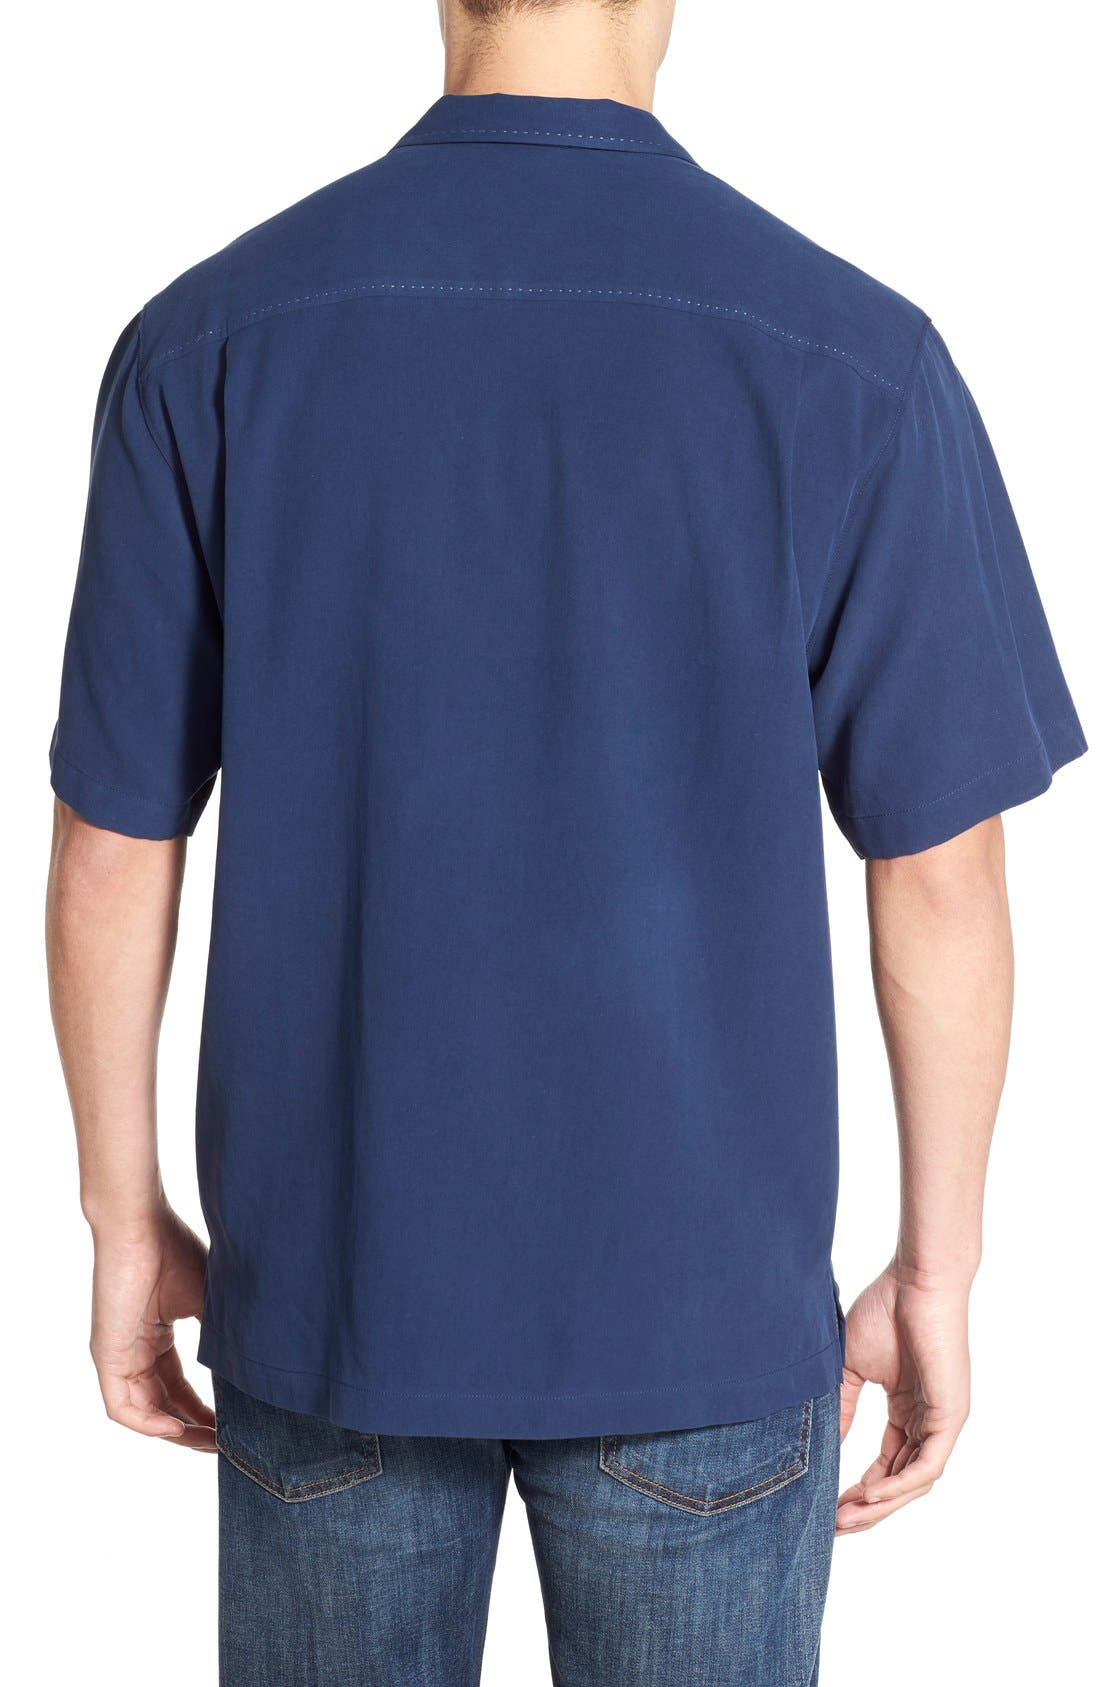 'Catalina Twill' Original Fit Silk Camp Shirt,                             Alternate thumbnail 2, color,                             Navy